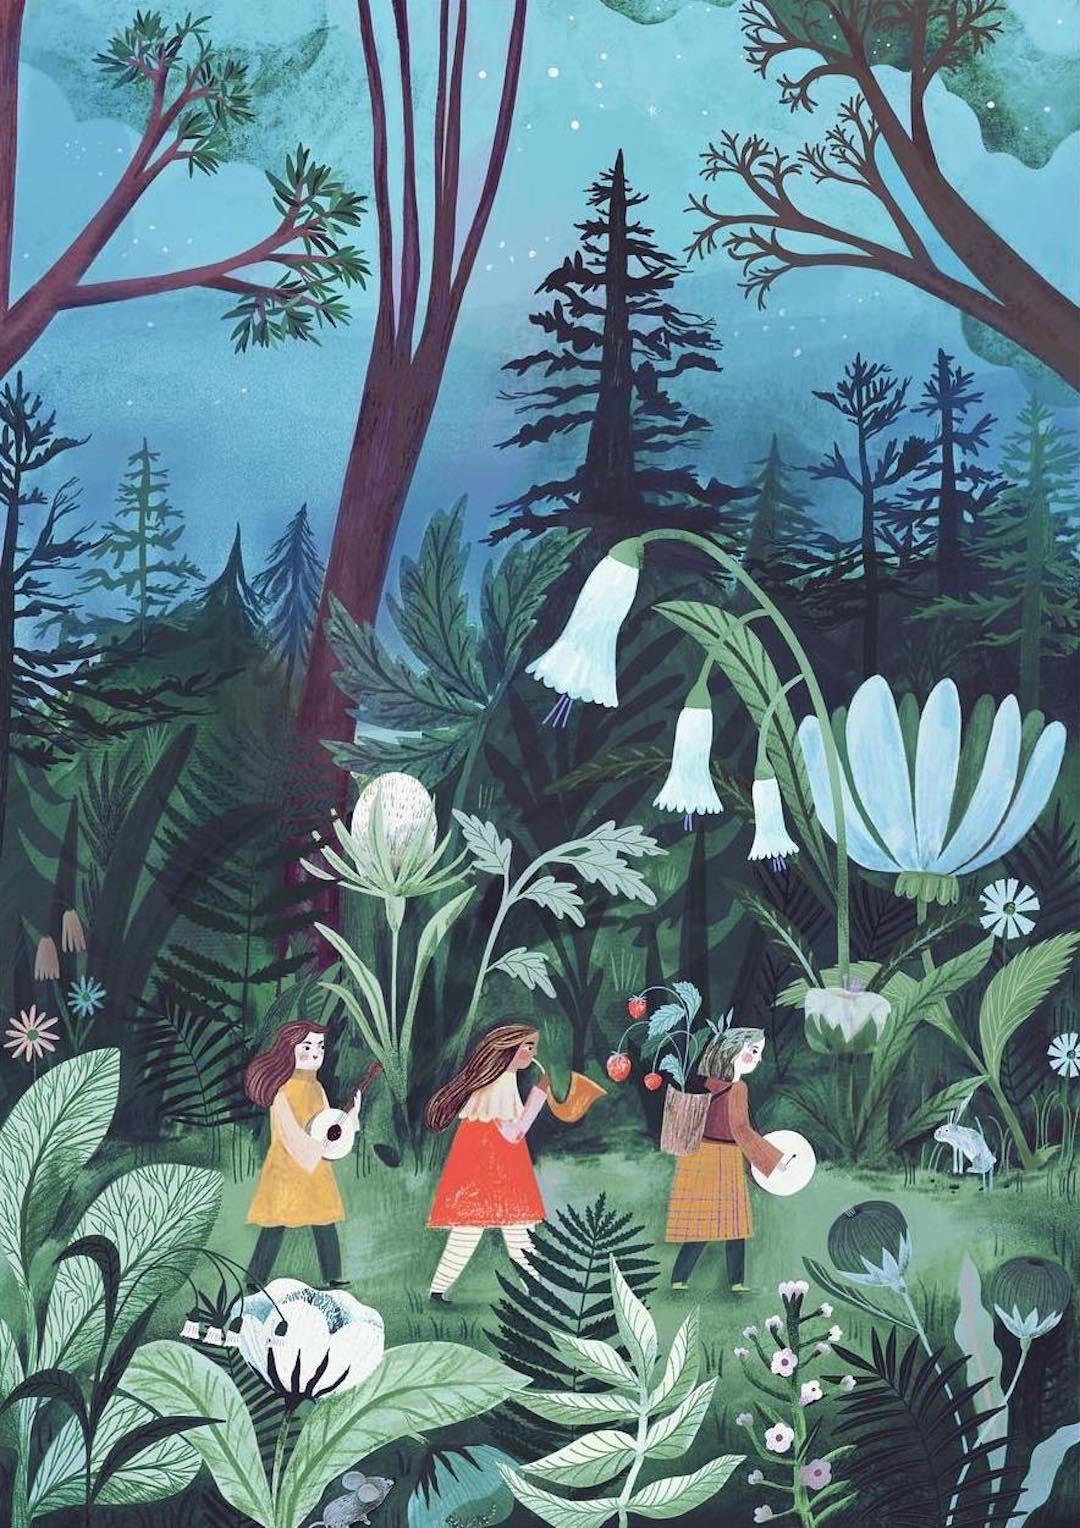 narrative illustration by adelina